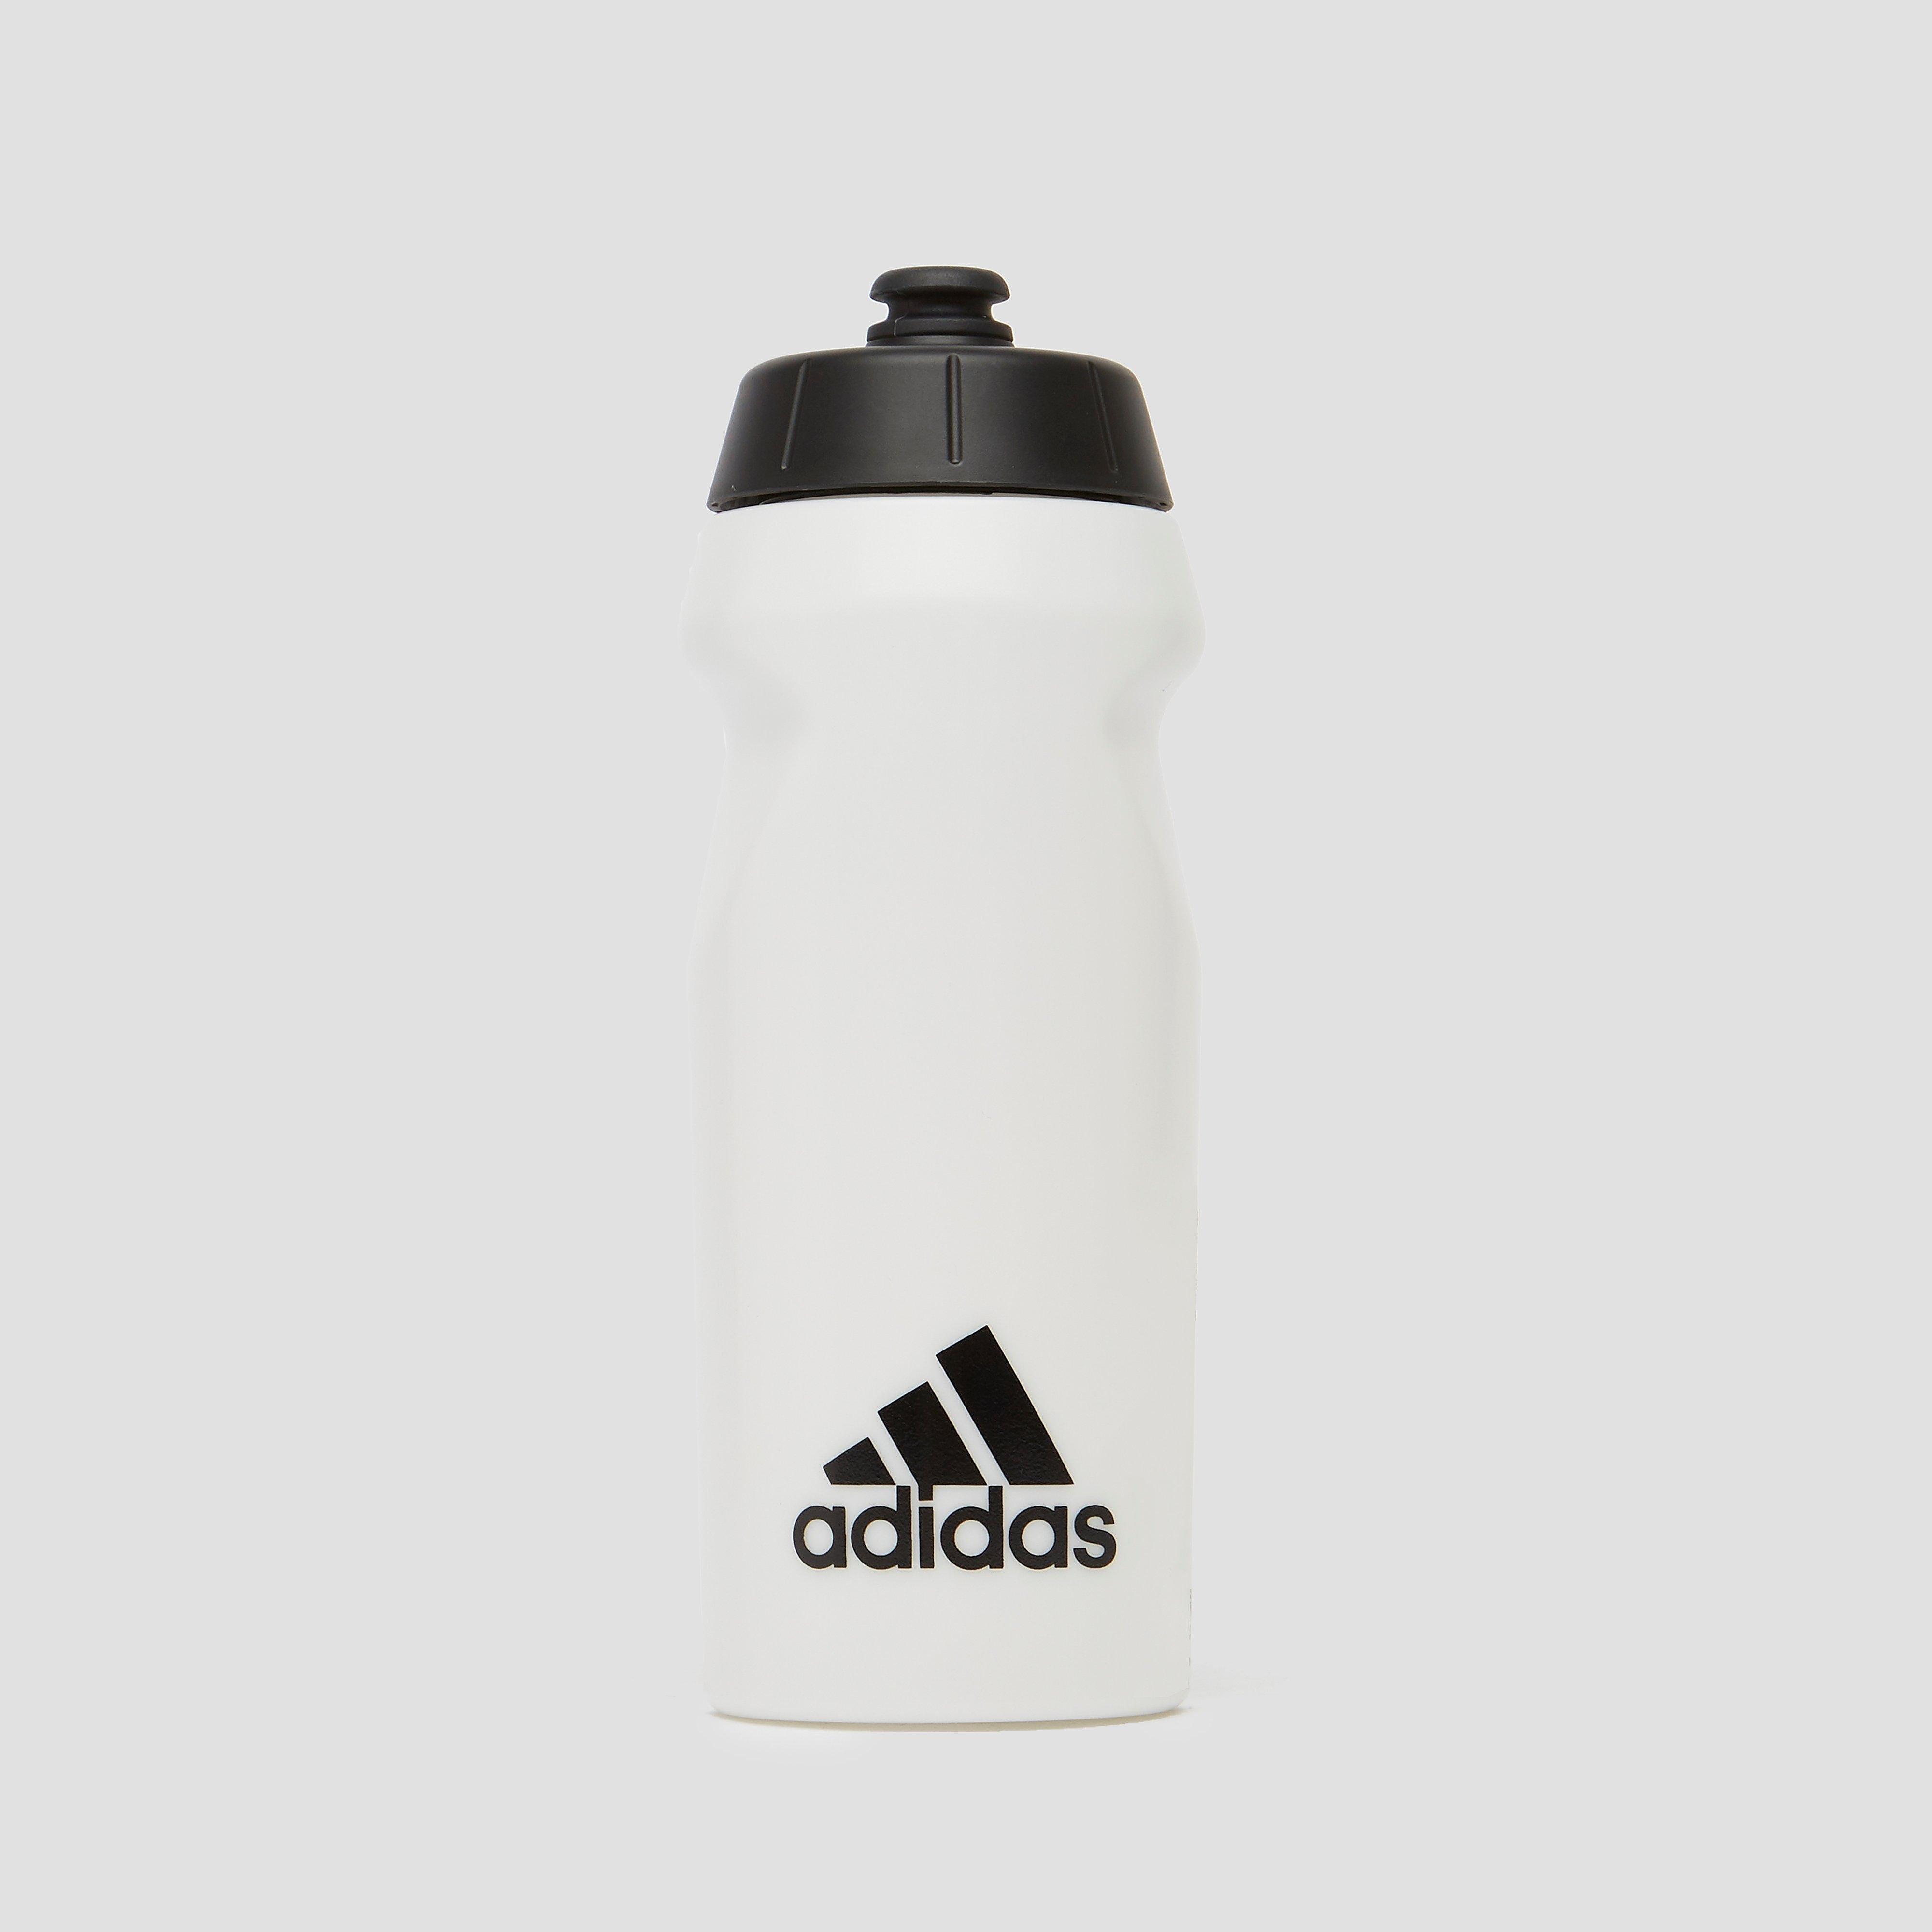 adidas Performance bidon 0,5 liter zwart Kinderen